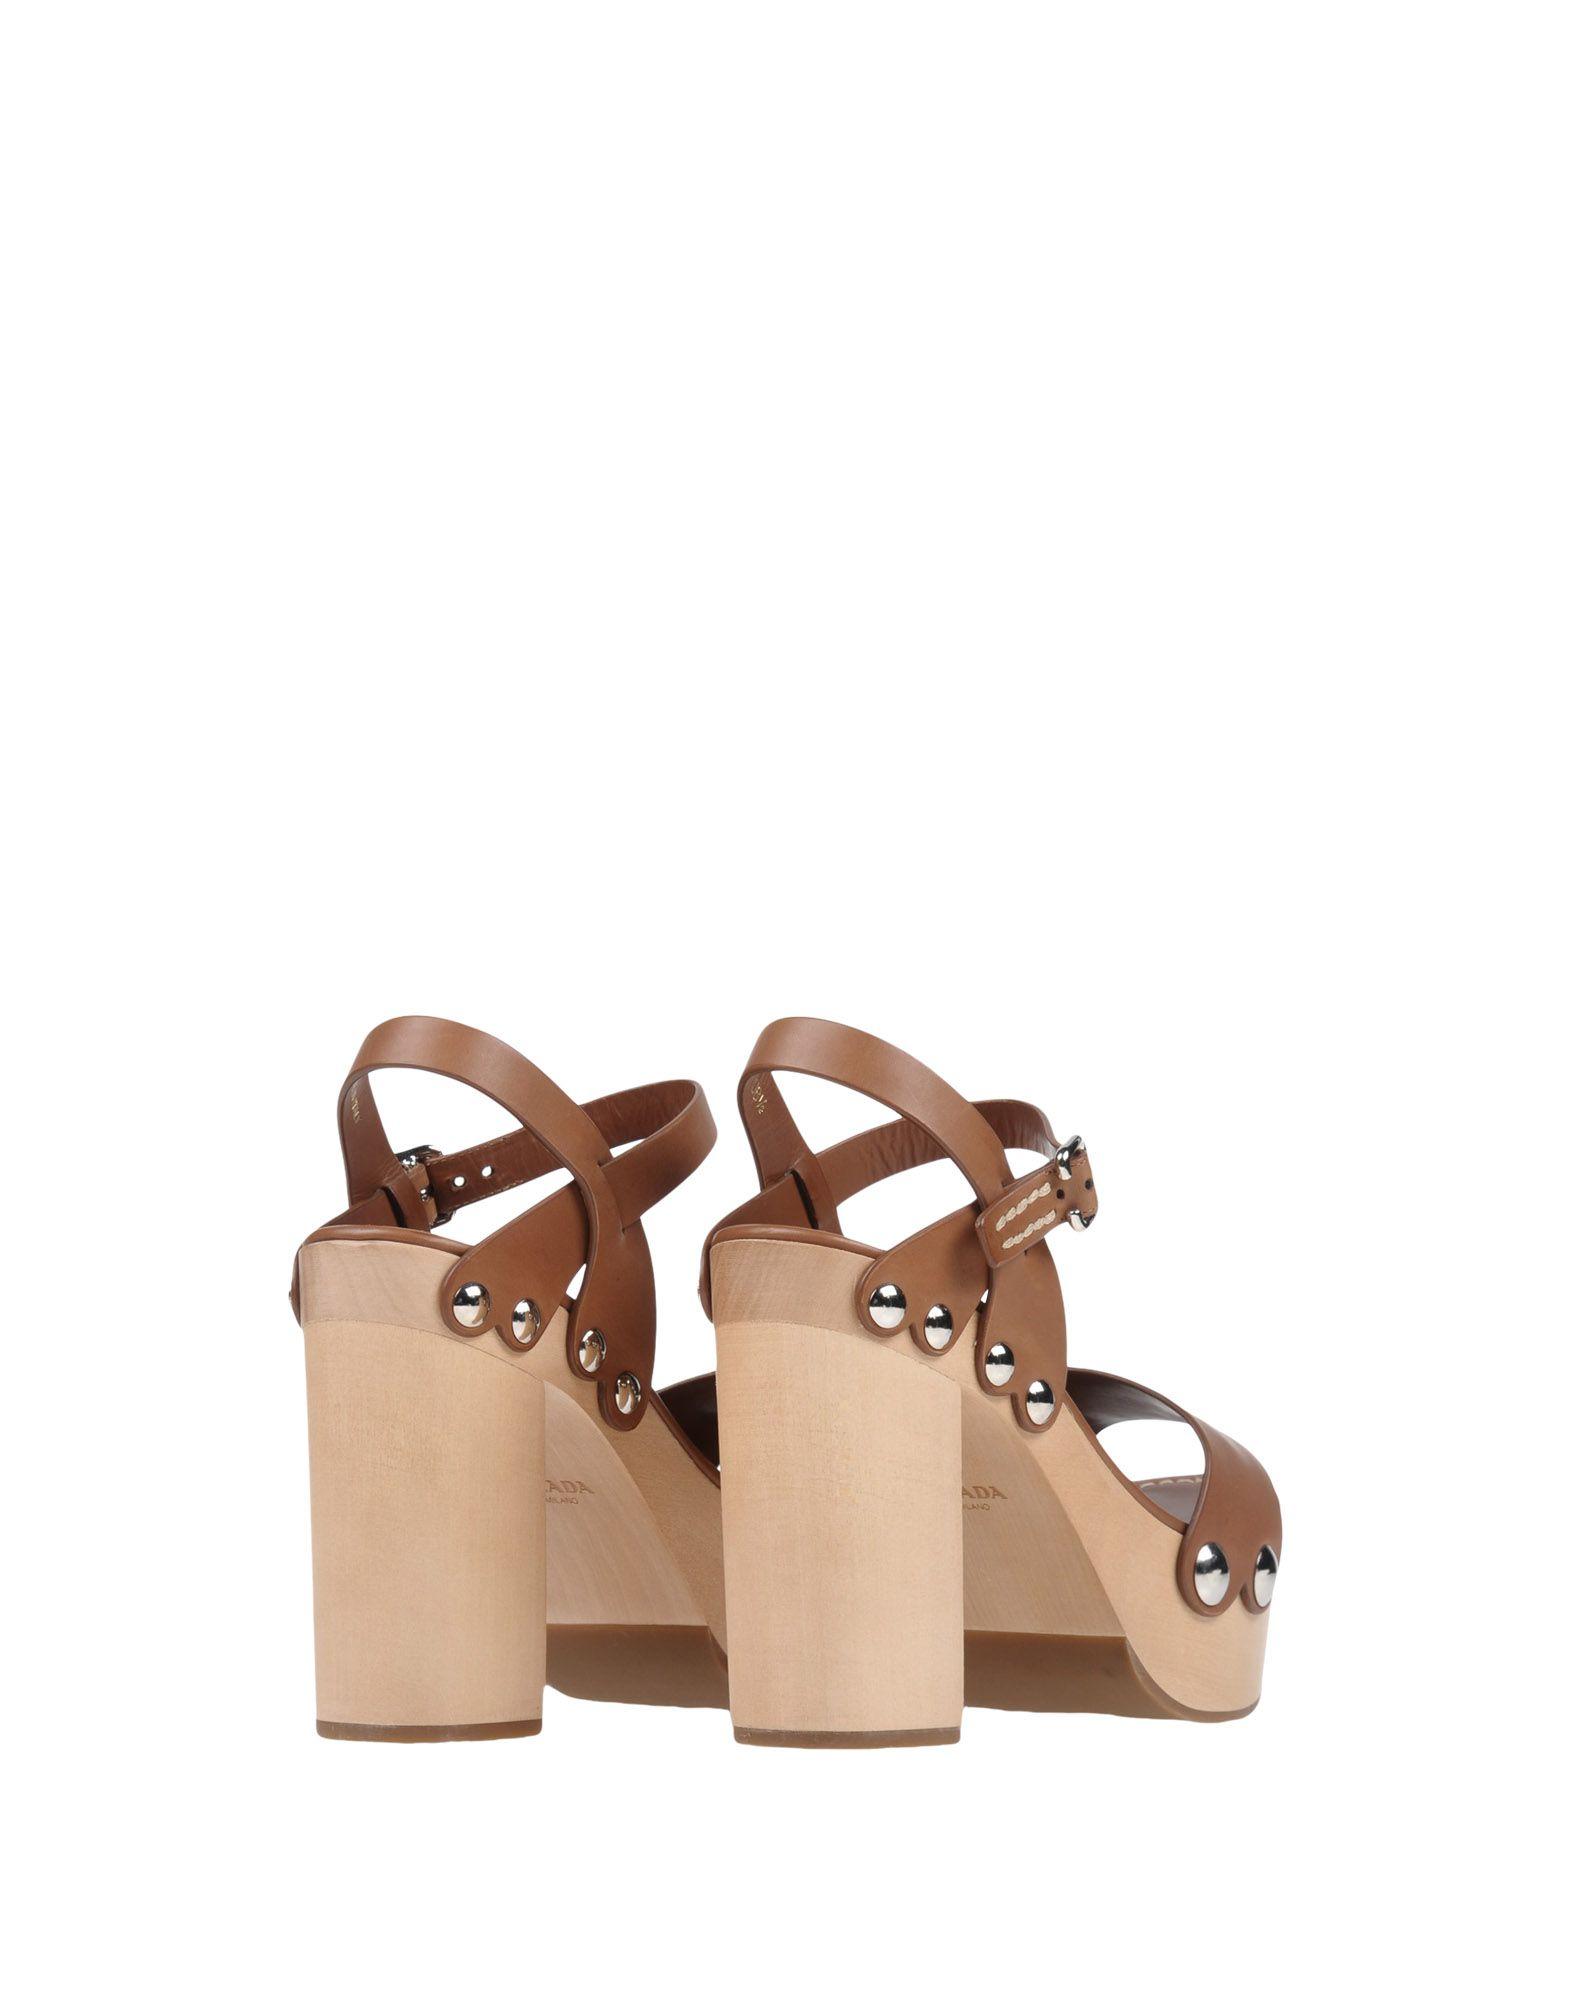 prada femmes sandales - femmes prada prada 11420828xf sandales en ligne le royaume - uni - 496ef2